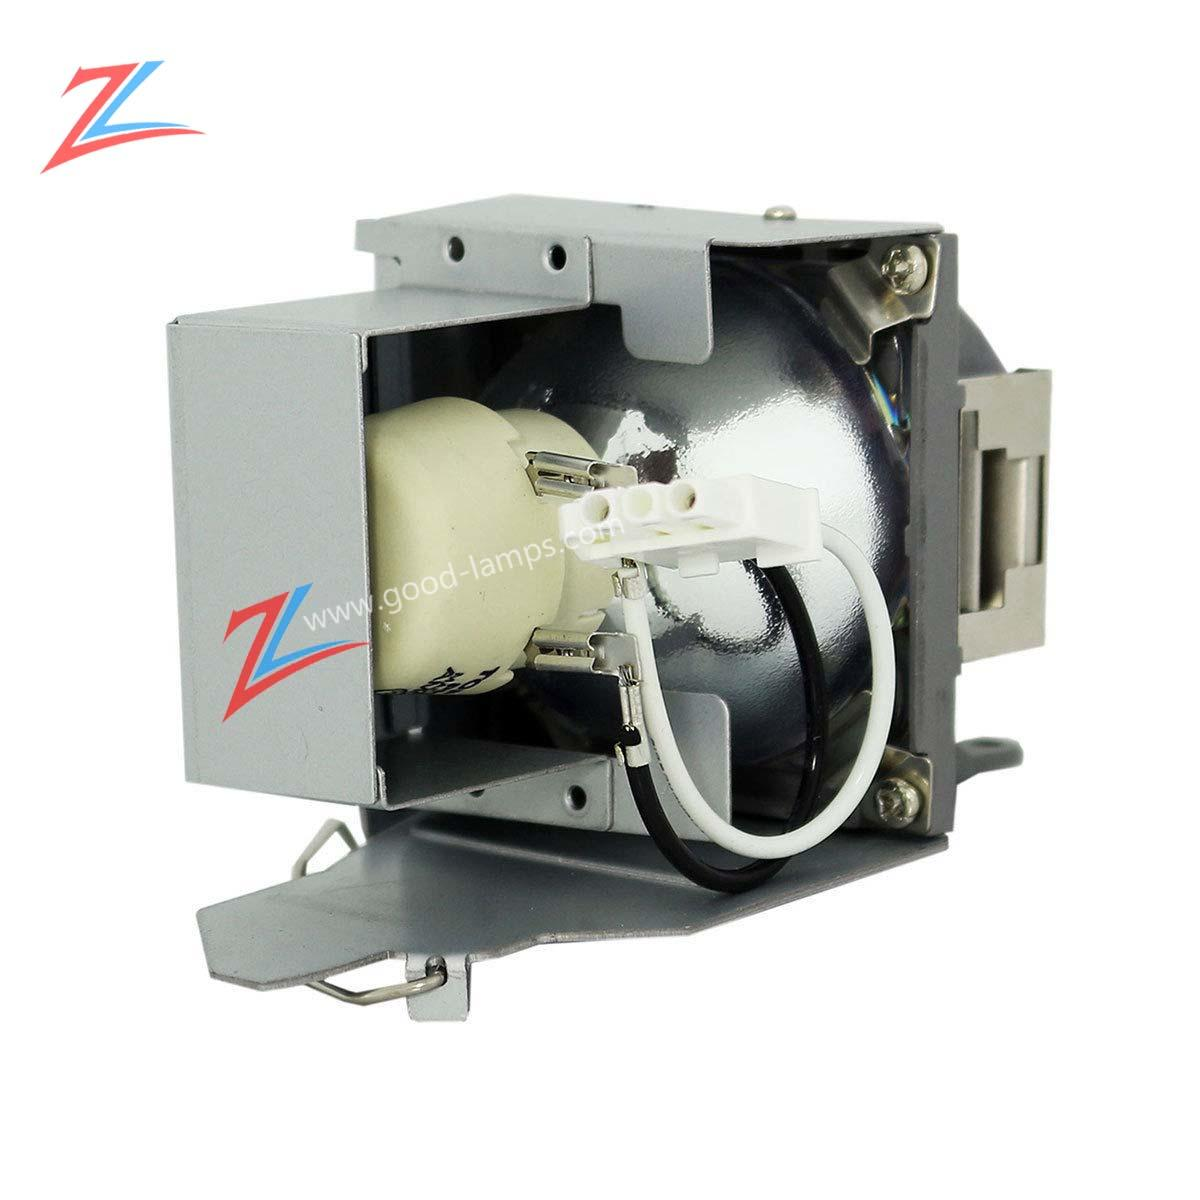 5J.J9V05.001 original projector lamp for BenQ ML7437 MS619ST MS630ST MW632ST MX620ST MX631ST